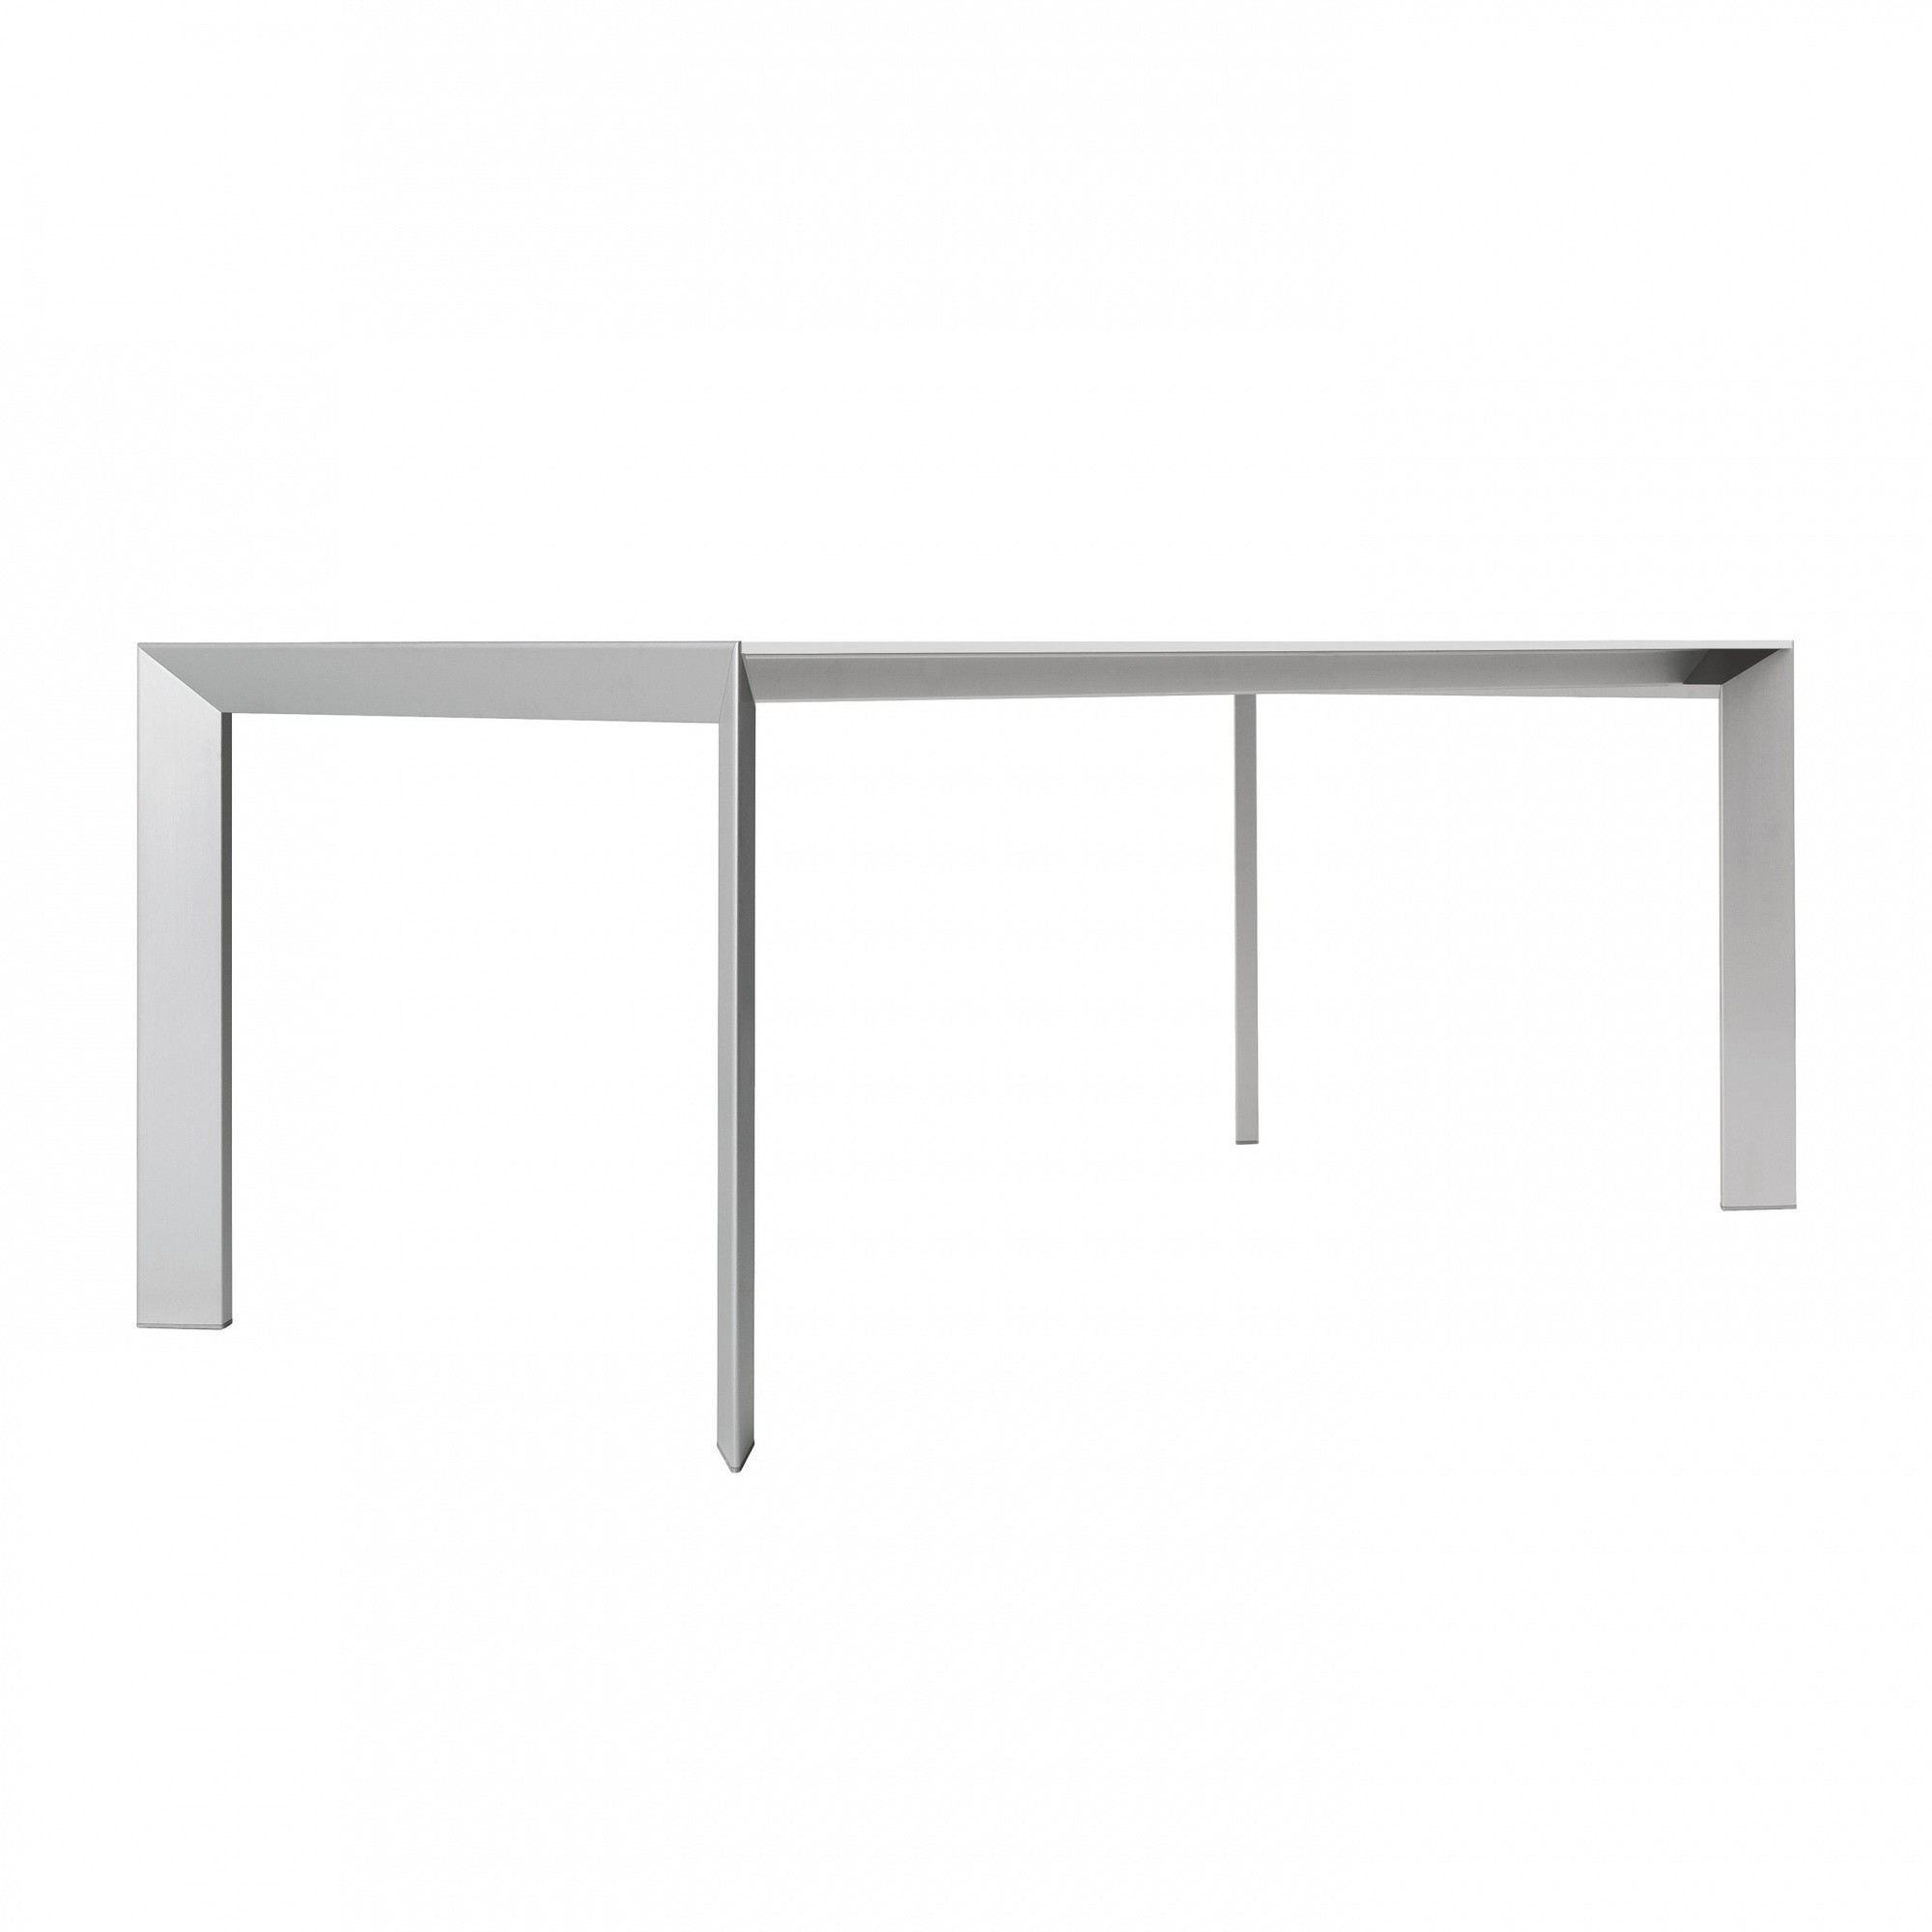 Kristalia Nori Alucompact Dining Table Extendable Ambientedirect